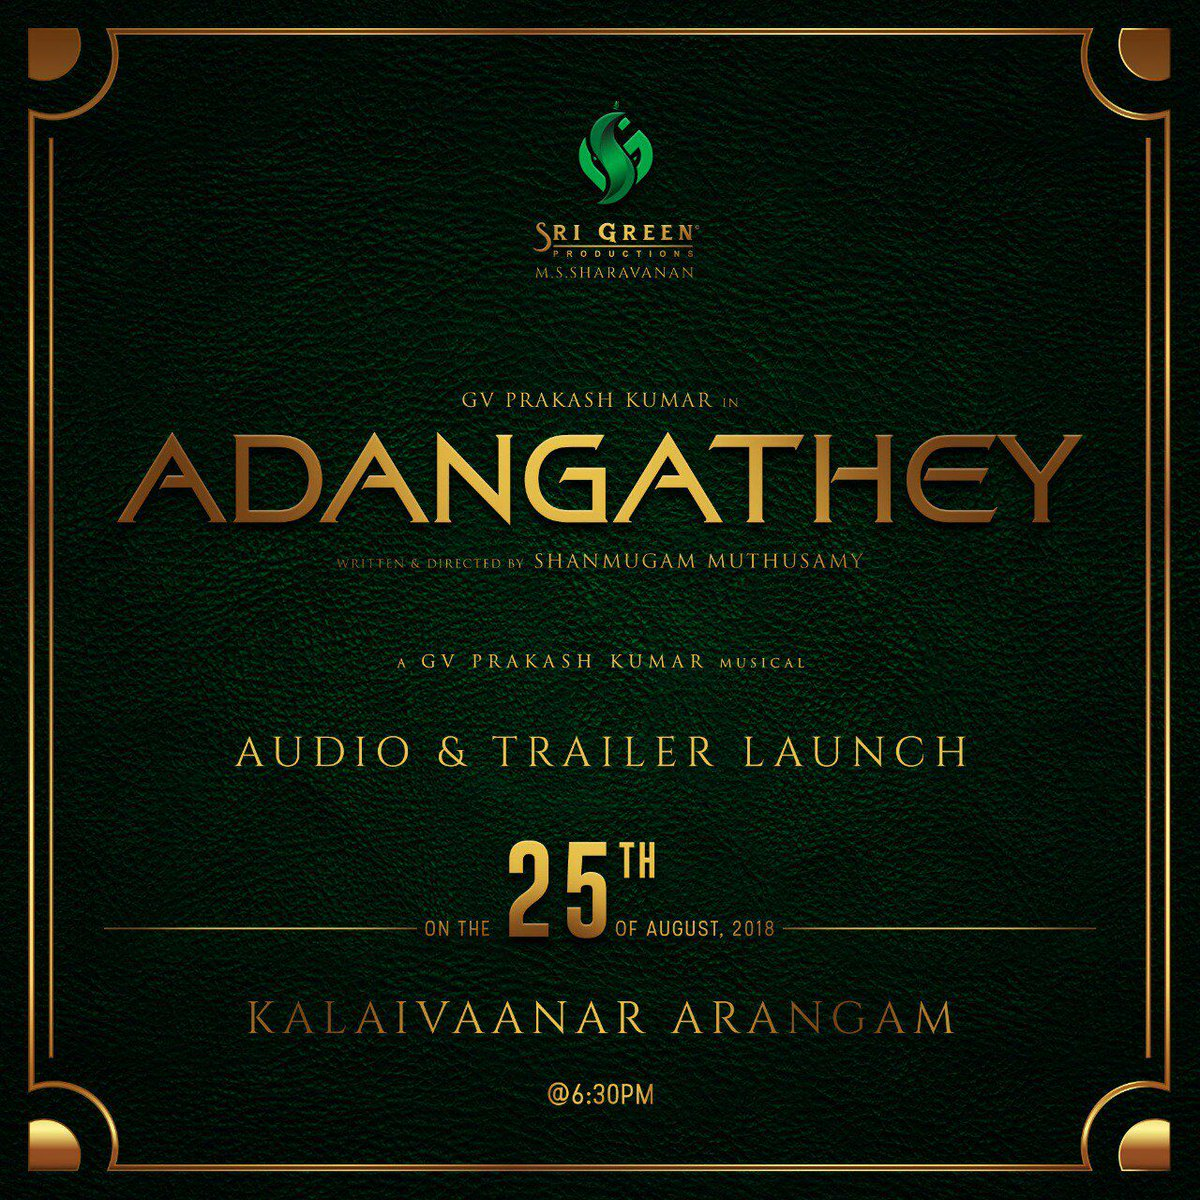 #Adangathey audio &amp; Trailer launch 25th Aug Eve 6.30pm   @gvprakash magical  on the way  @gvprakash @shan_dir @Surbhiactress @Arunrajakamaraj @mandybedi @realsarathkumar @srigreen_pro @SriGreen_Offl @NoufalBabujohn<br>http://pic.twitter.com/cxLD7A9RxI